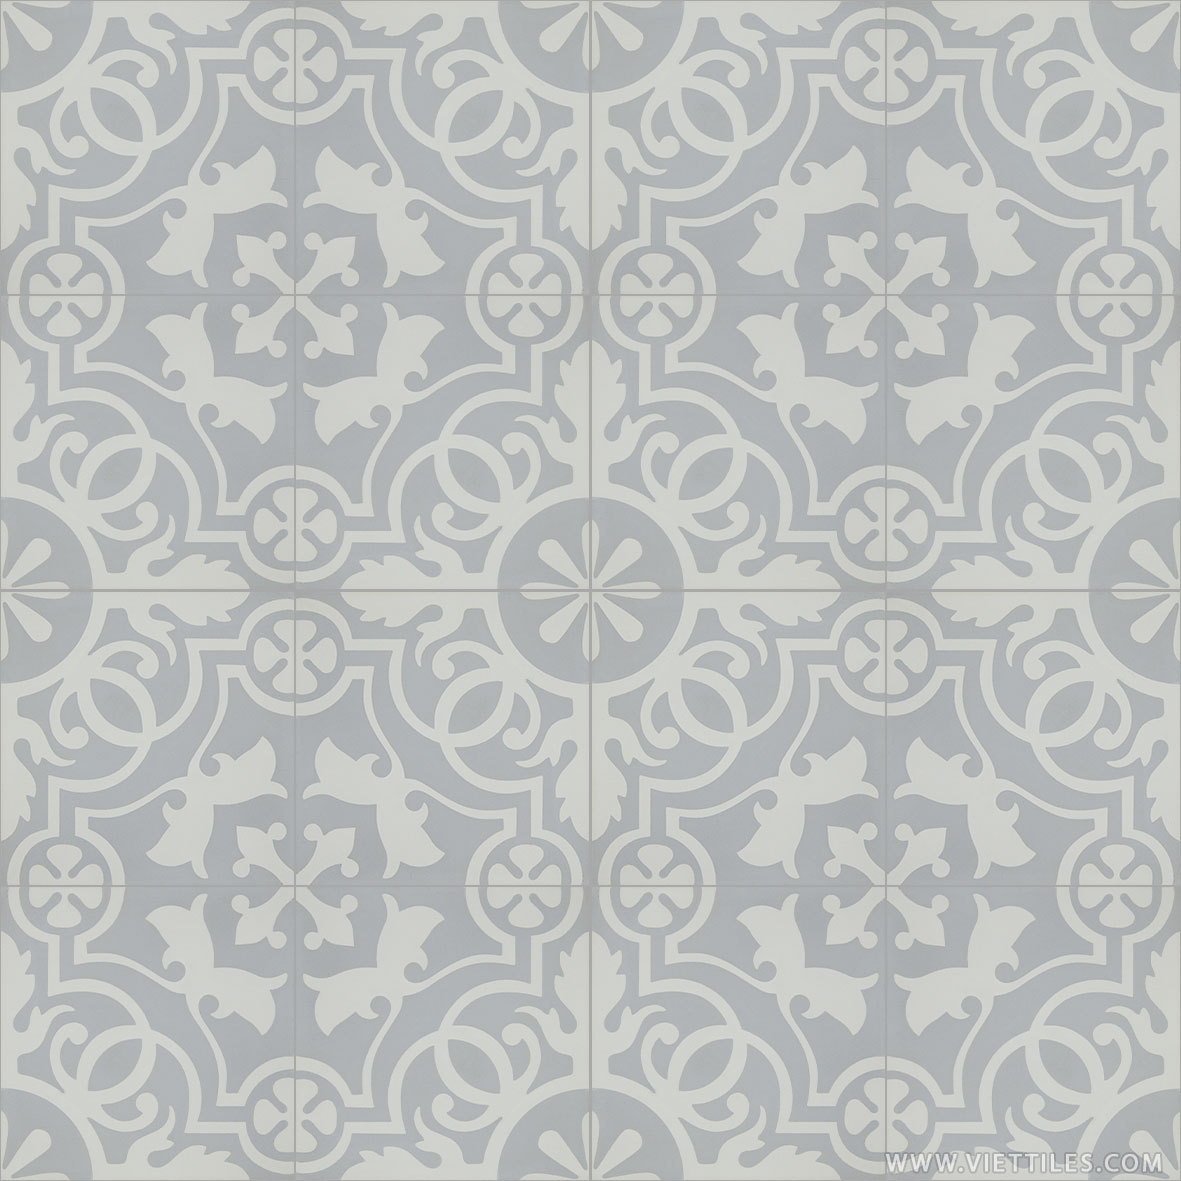 V20-694-T-01 Cement tile